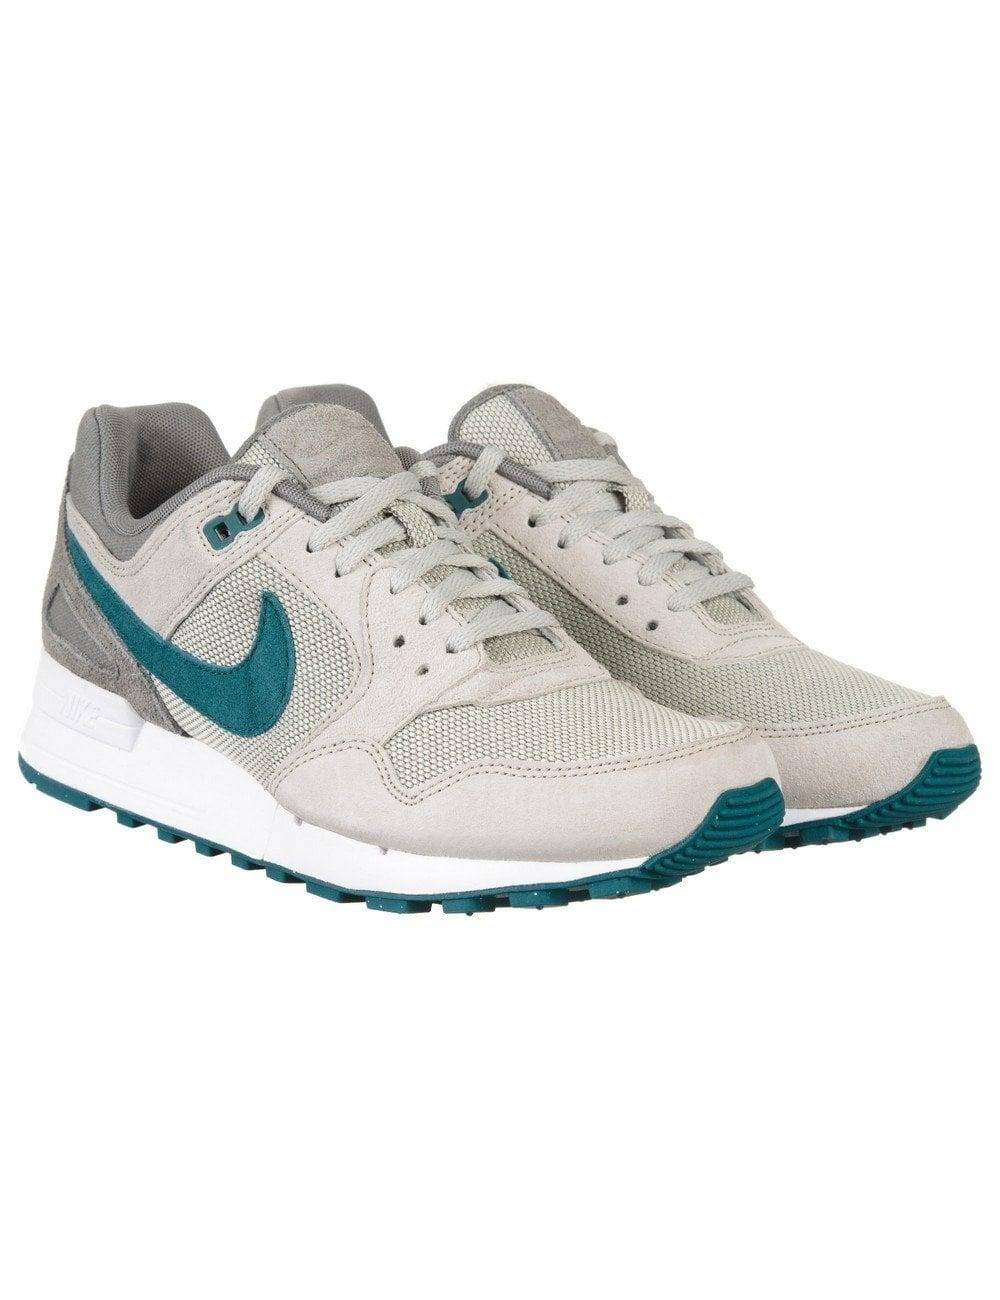 a9970fc3c193 Nike Air Pegasus 89 Shoes - Lunar Grey Teal - Footwear from Fat ...